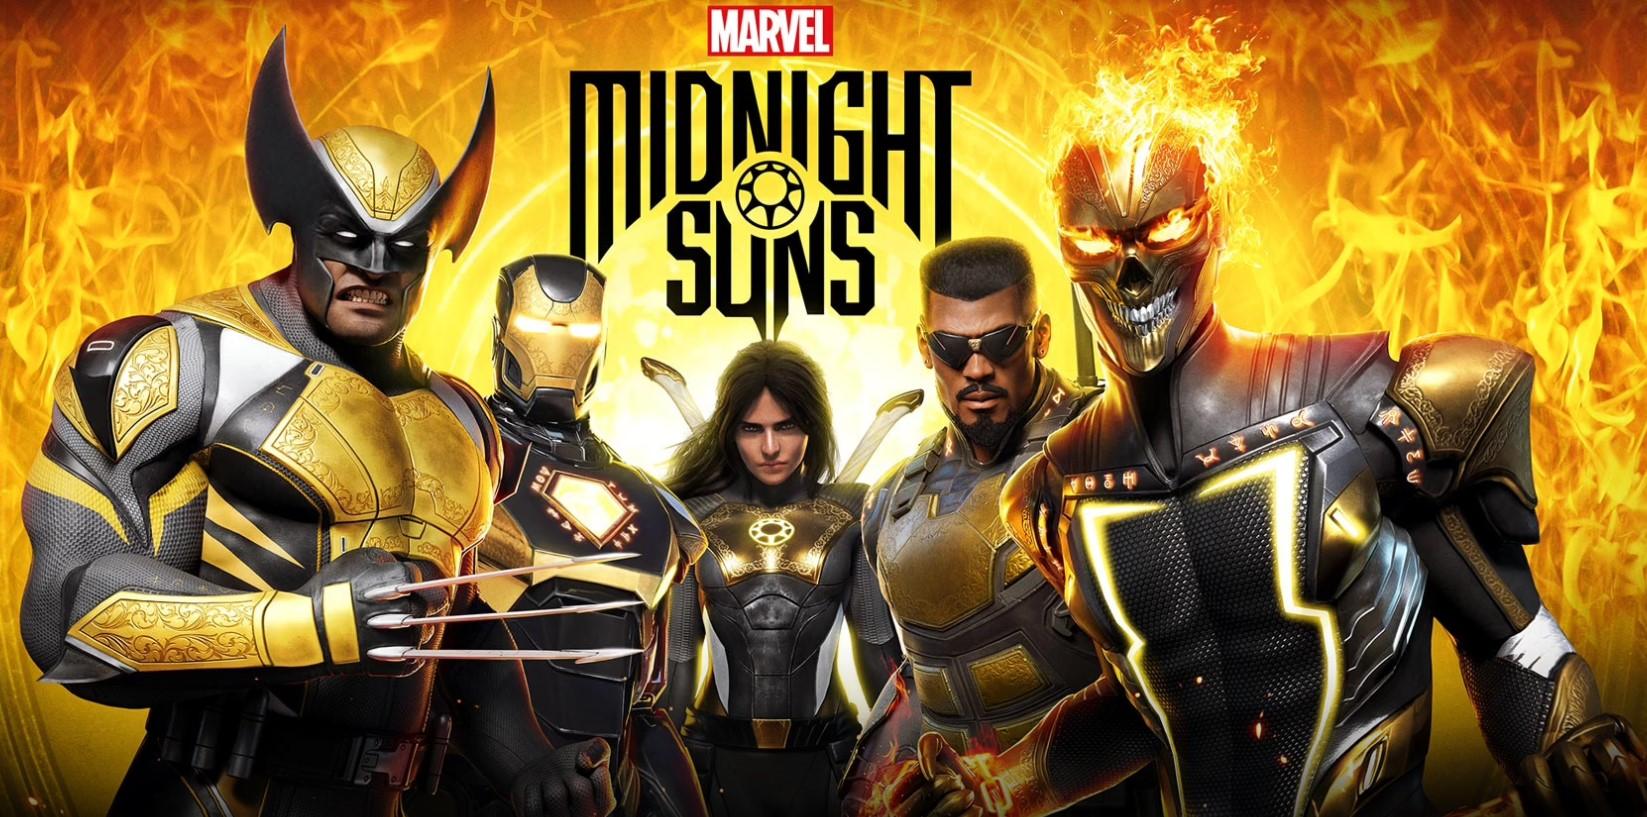 Marvel Midnight Suns video game